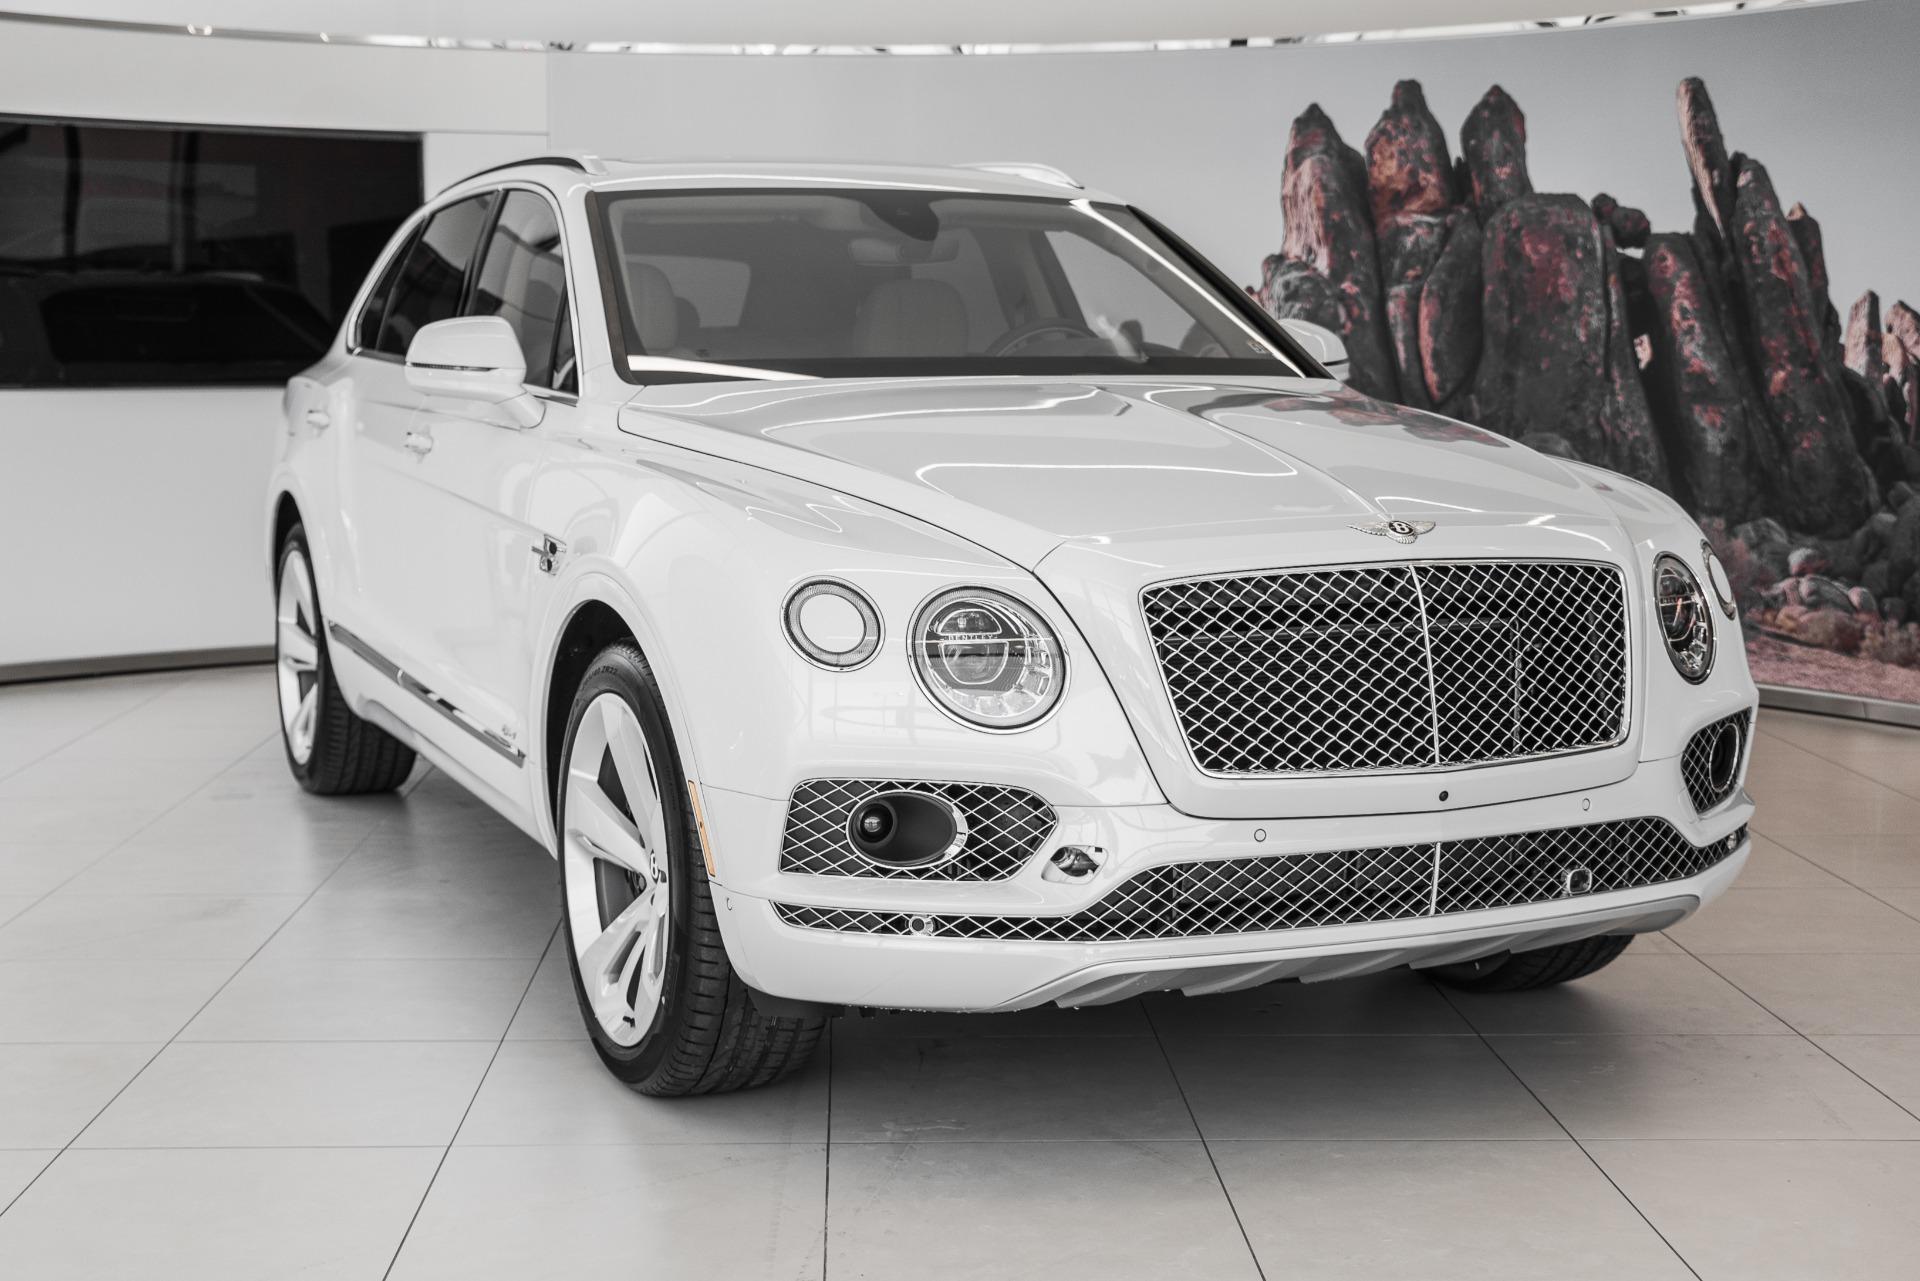 2020 Bentley Bentayga Hybrid Stock 20n027948 For Sale Near Vienna Va Va Bentley Dealer For Sale In Vienna Va 20n027948 Exclusive Automotive Group